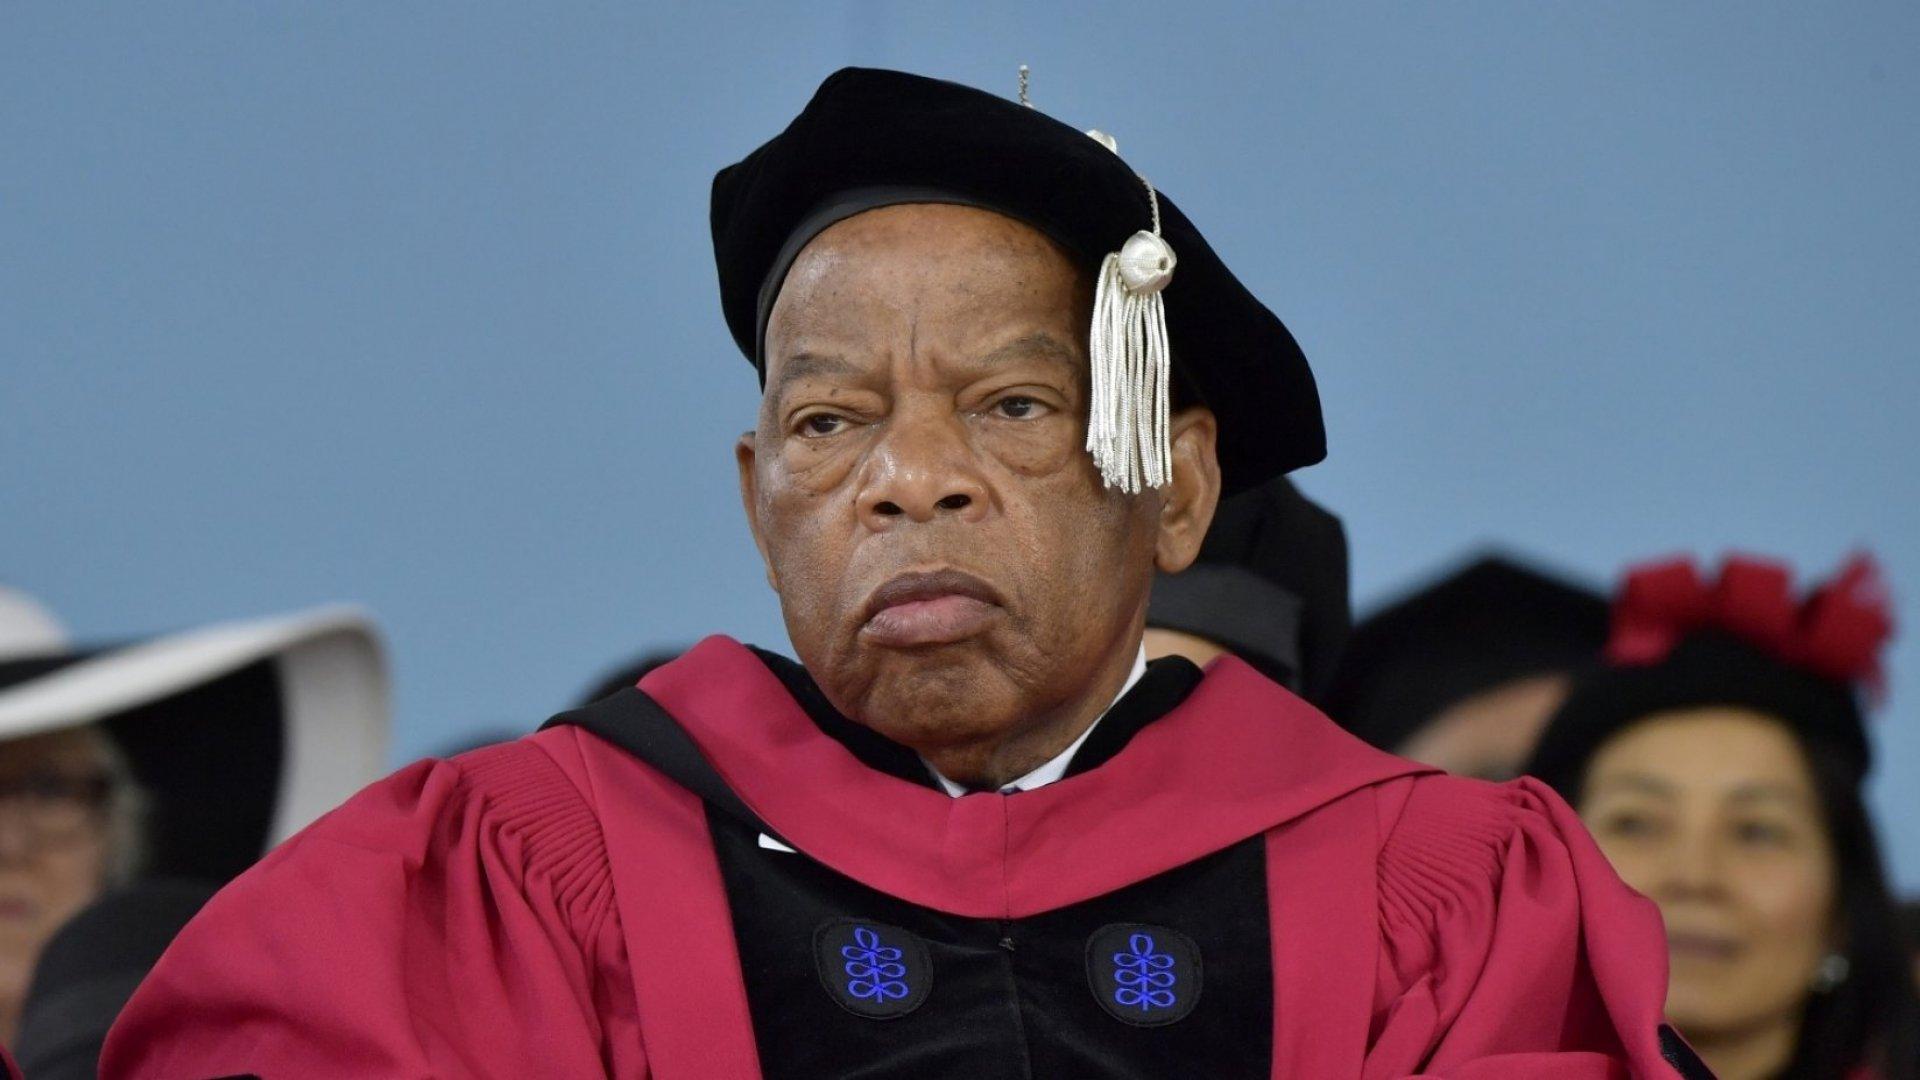 Civil Rights Icon John Lewis Tells Harvard Graduates to Save the World